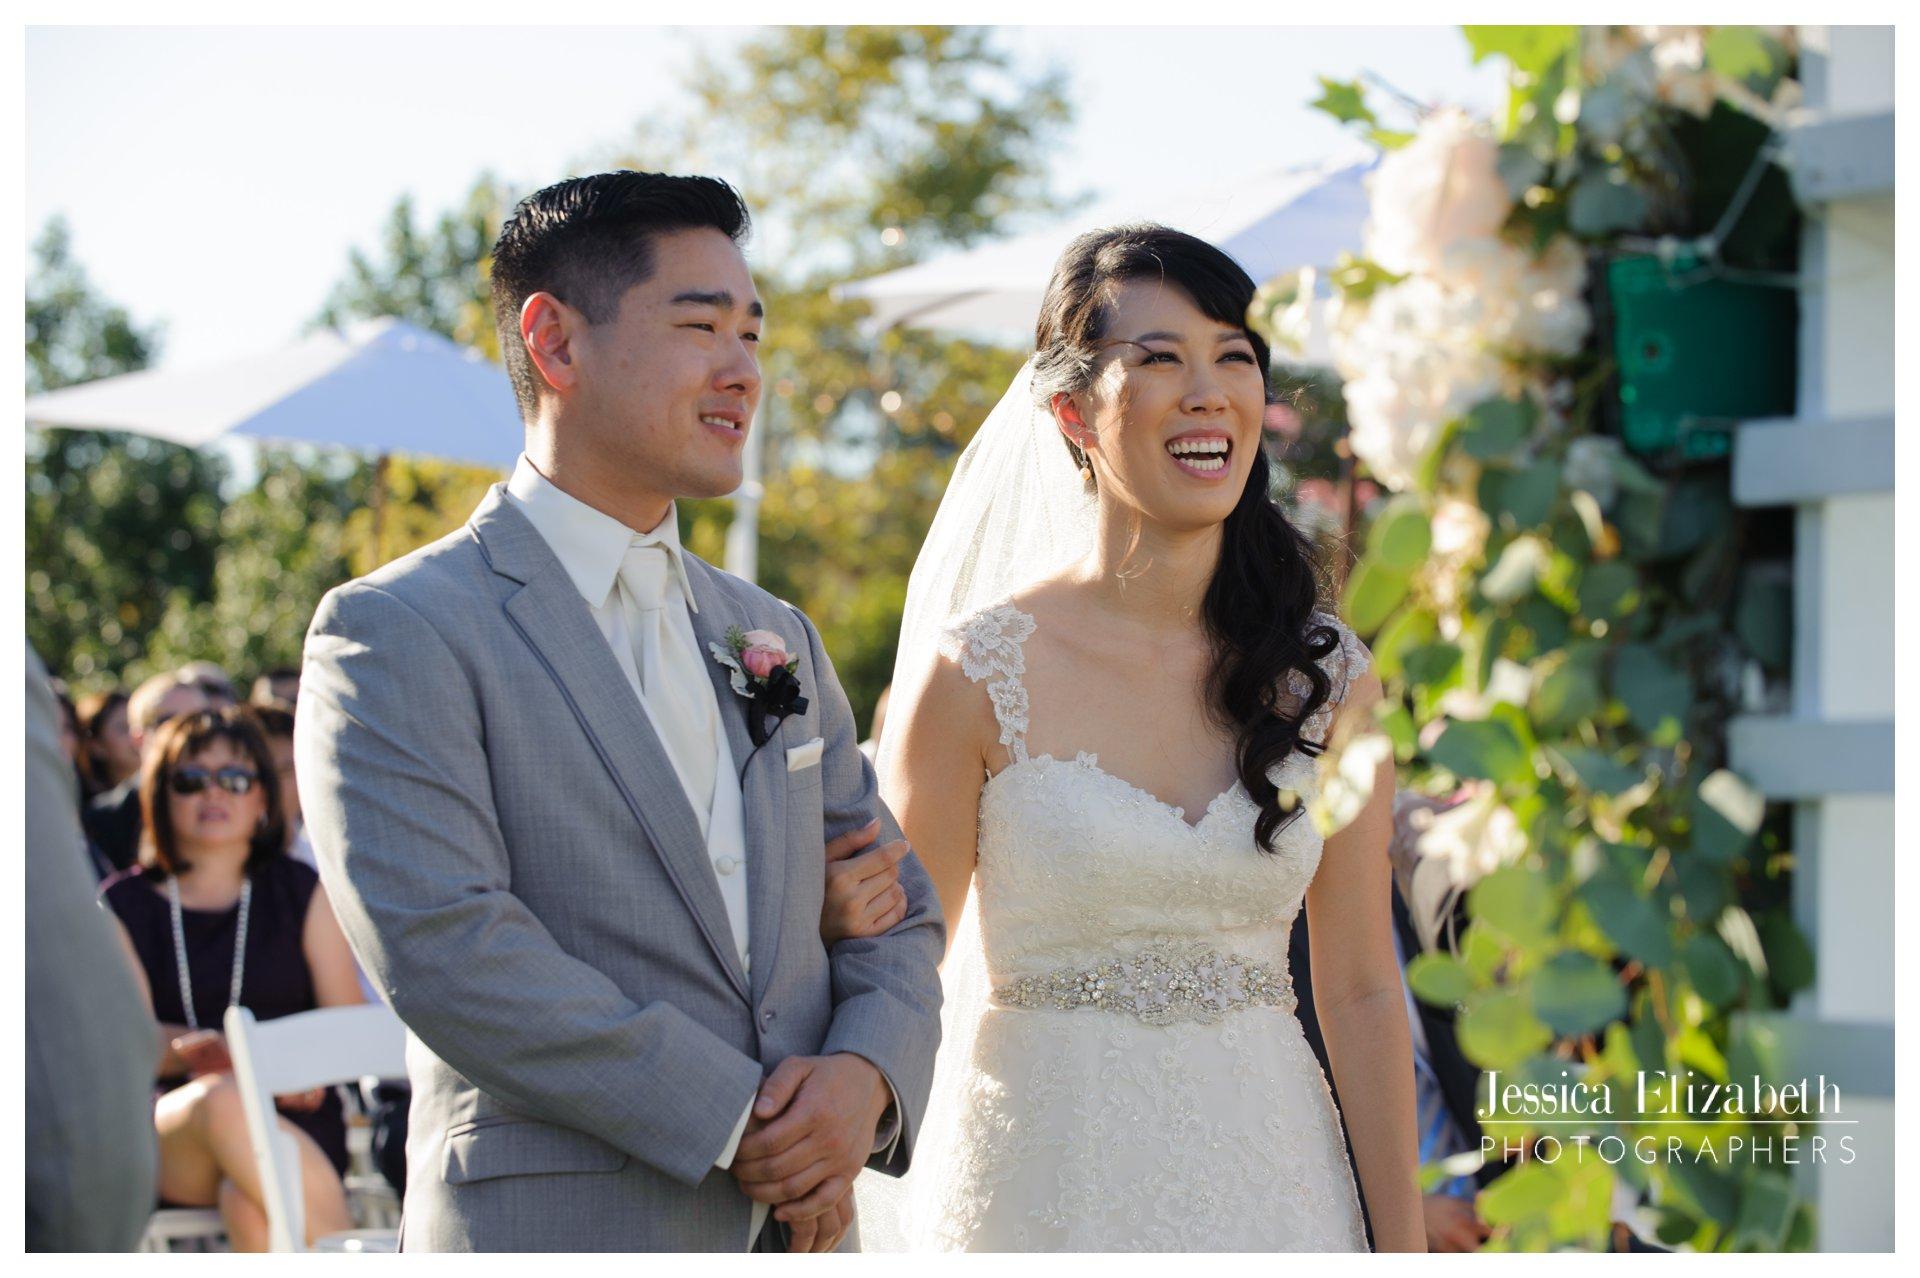 18-South Coast Botanic Garden Palos Verdes Wedding Photography by Jessica Elizabeth